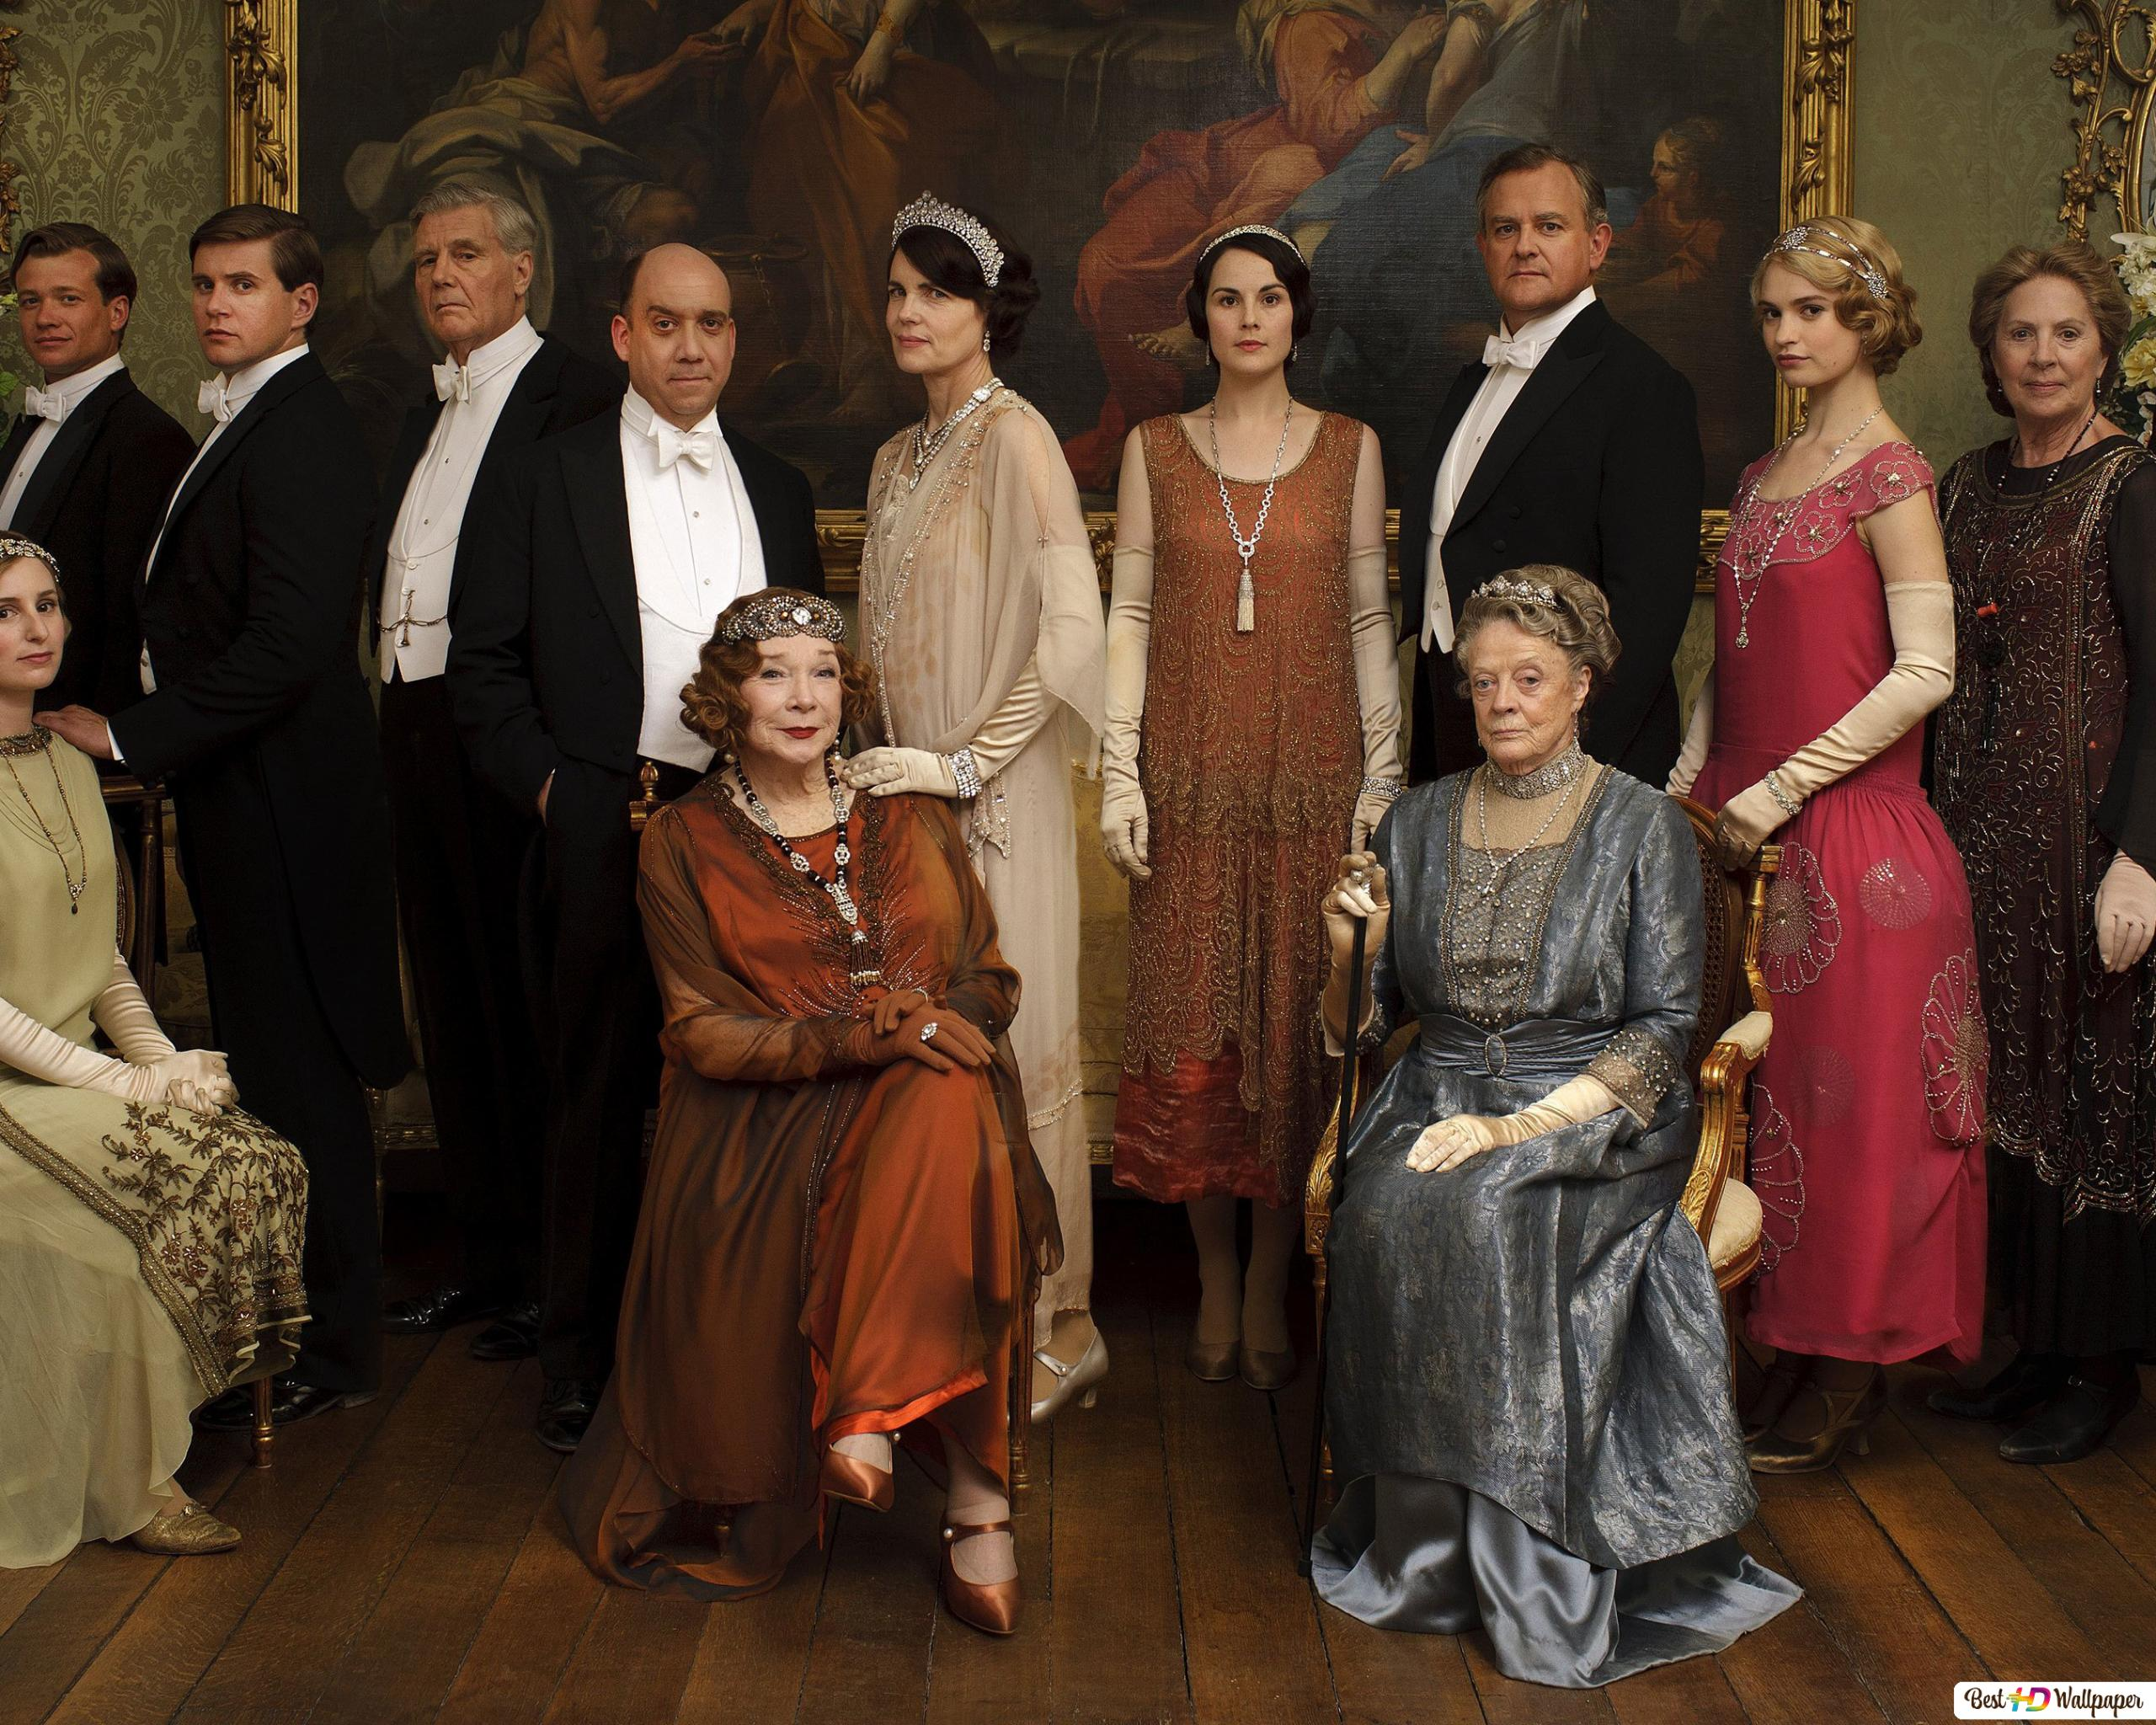 The Elder S Of Downton Abbey Hd Wallpaper Download